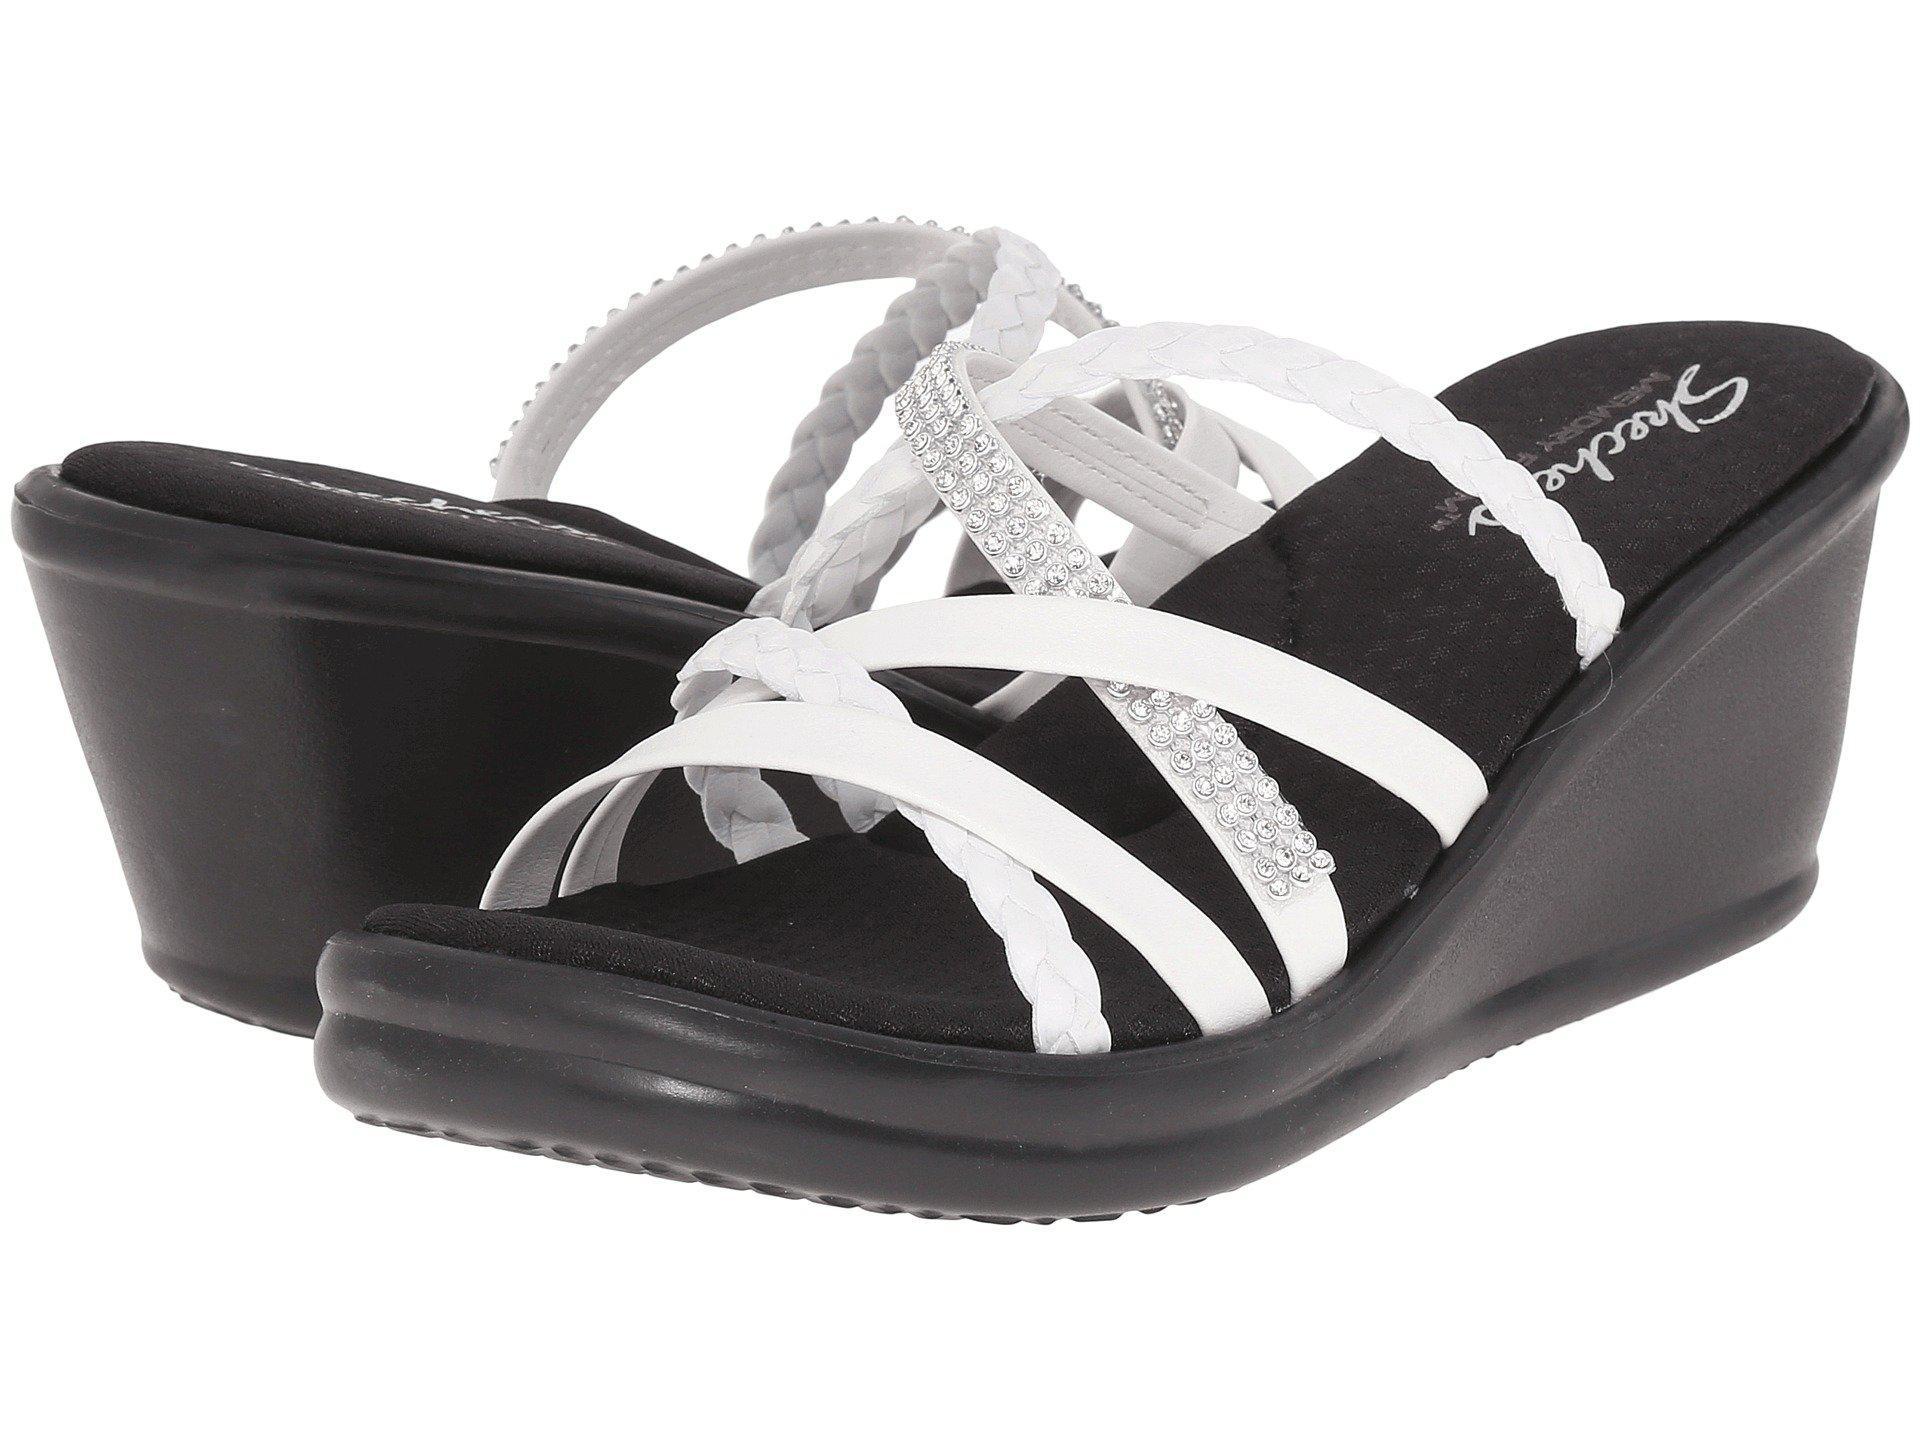 c163e0dad696 Lyst - Skechers Rumblers - Wild Child (white) Women s Sandals in White